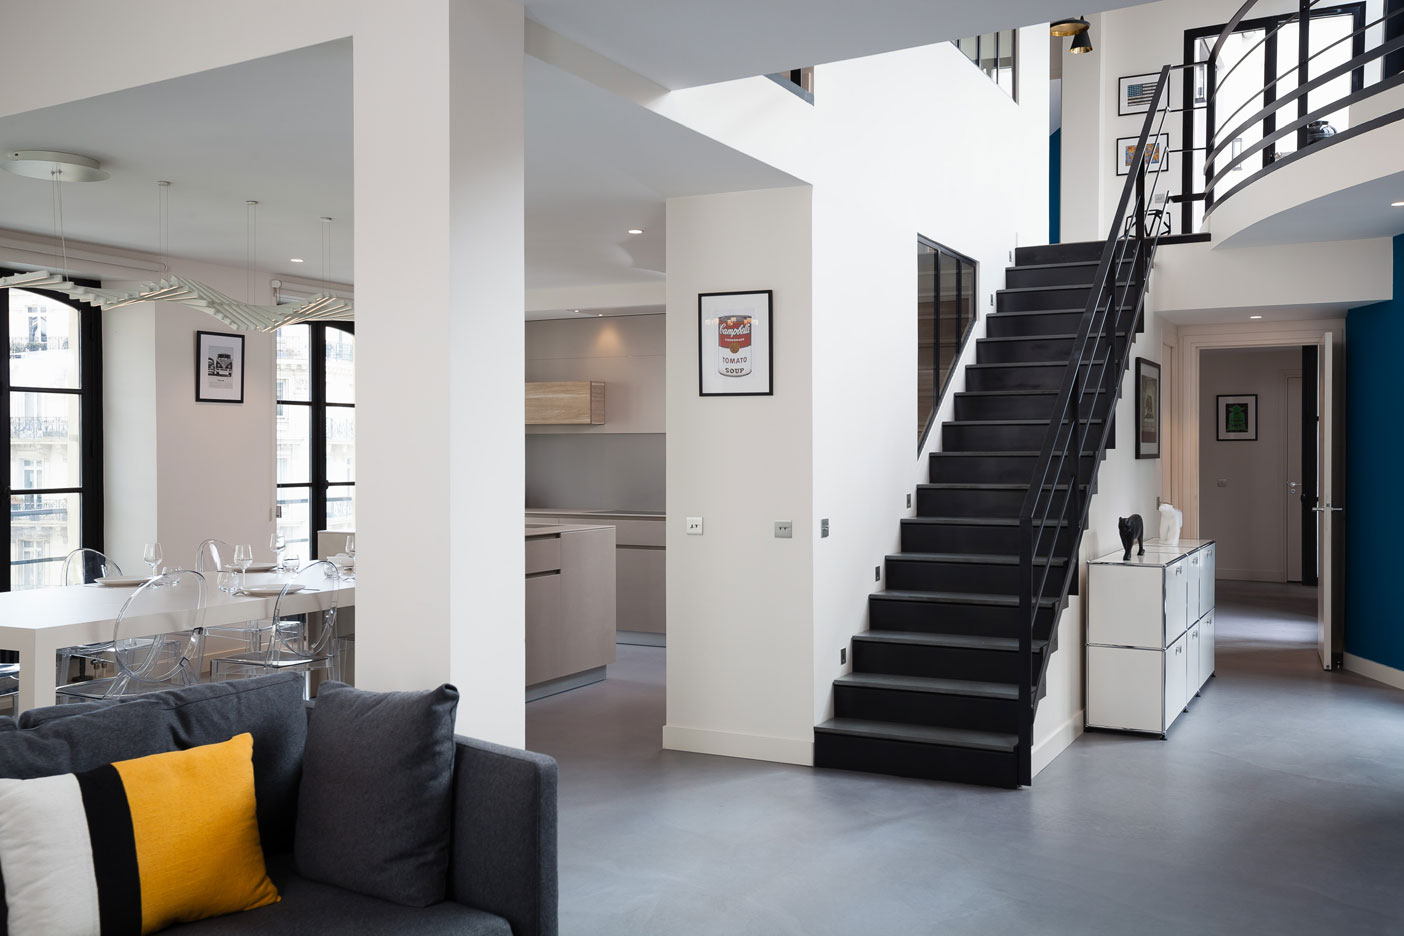 sea-paris-01-03-escalier-beton